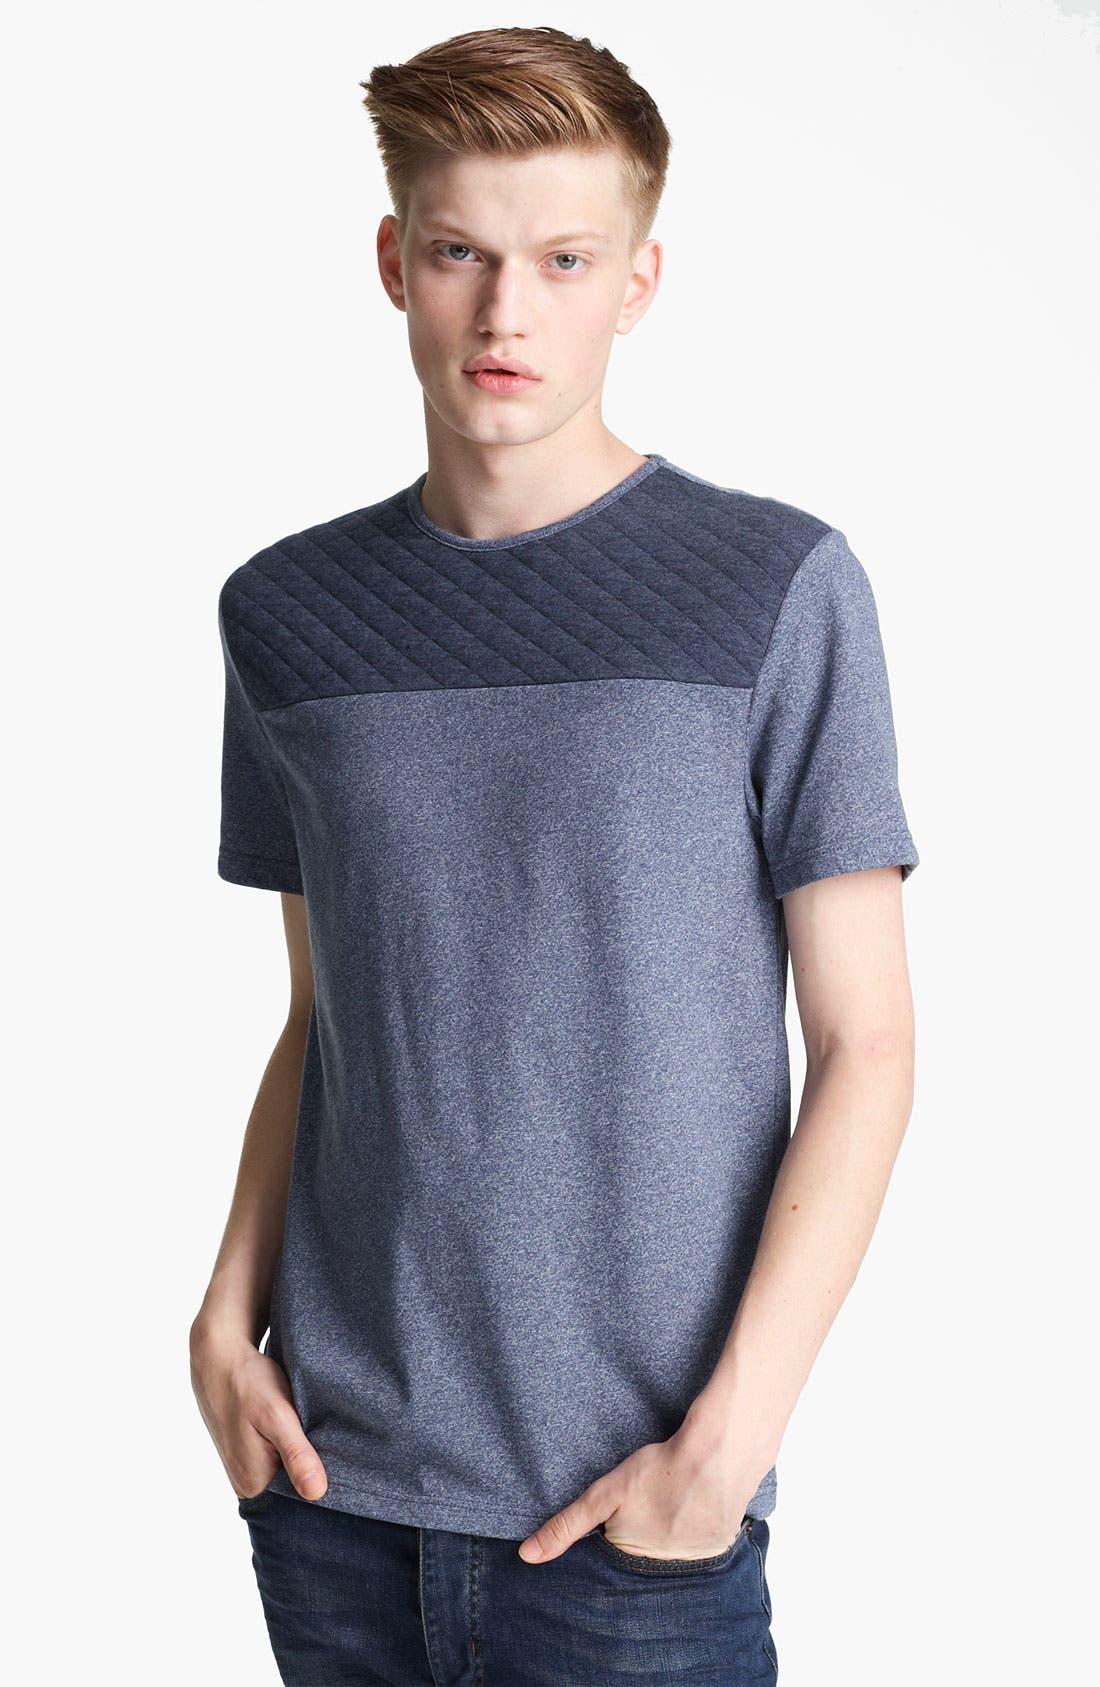 Alternate Image 1 Selected - Topman 'Cut & Sew' Quilted Yoke T-Shirt